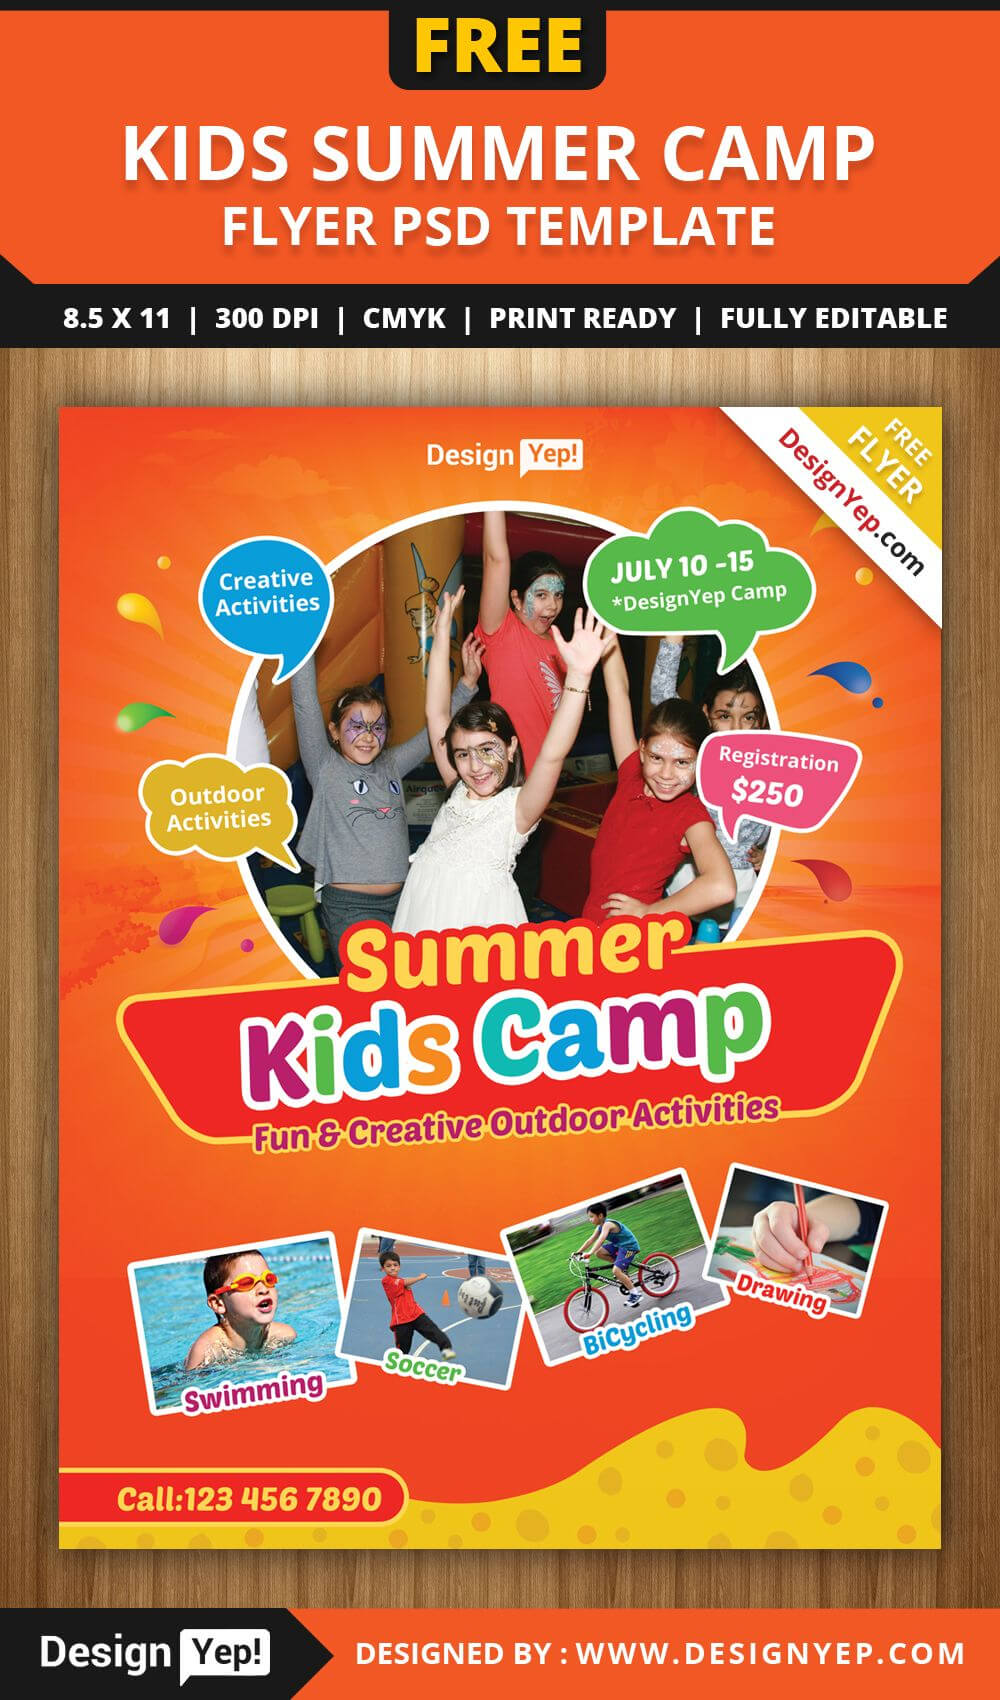 Free-Kids-Summer-Camp-Flyer-Psd-Template-8585-Designyep for Summer Camp Brochure Template Free Download